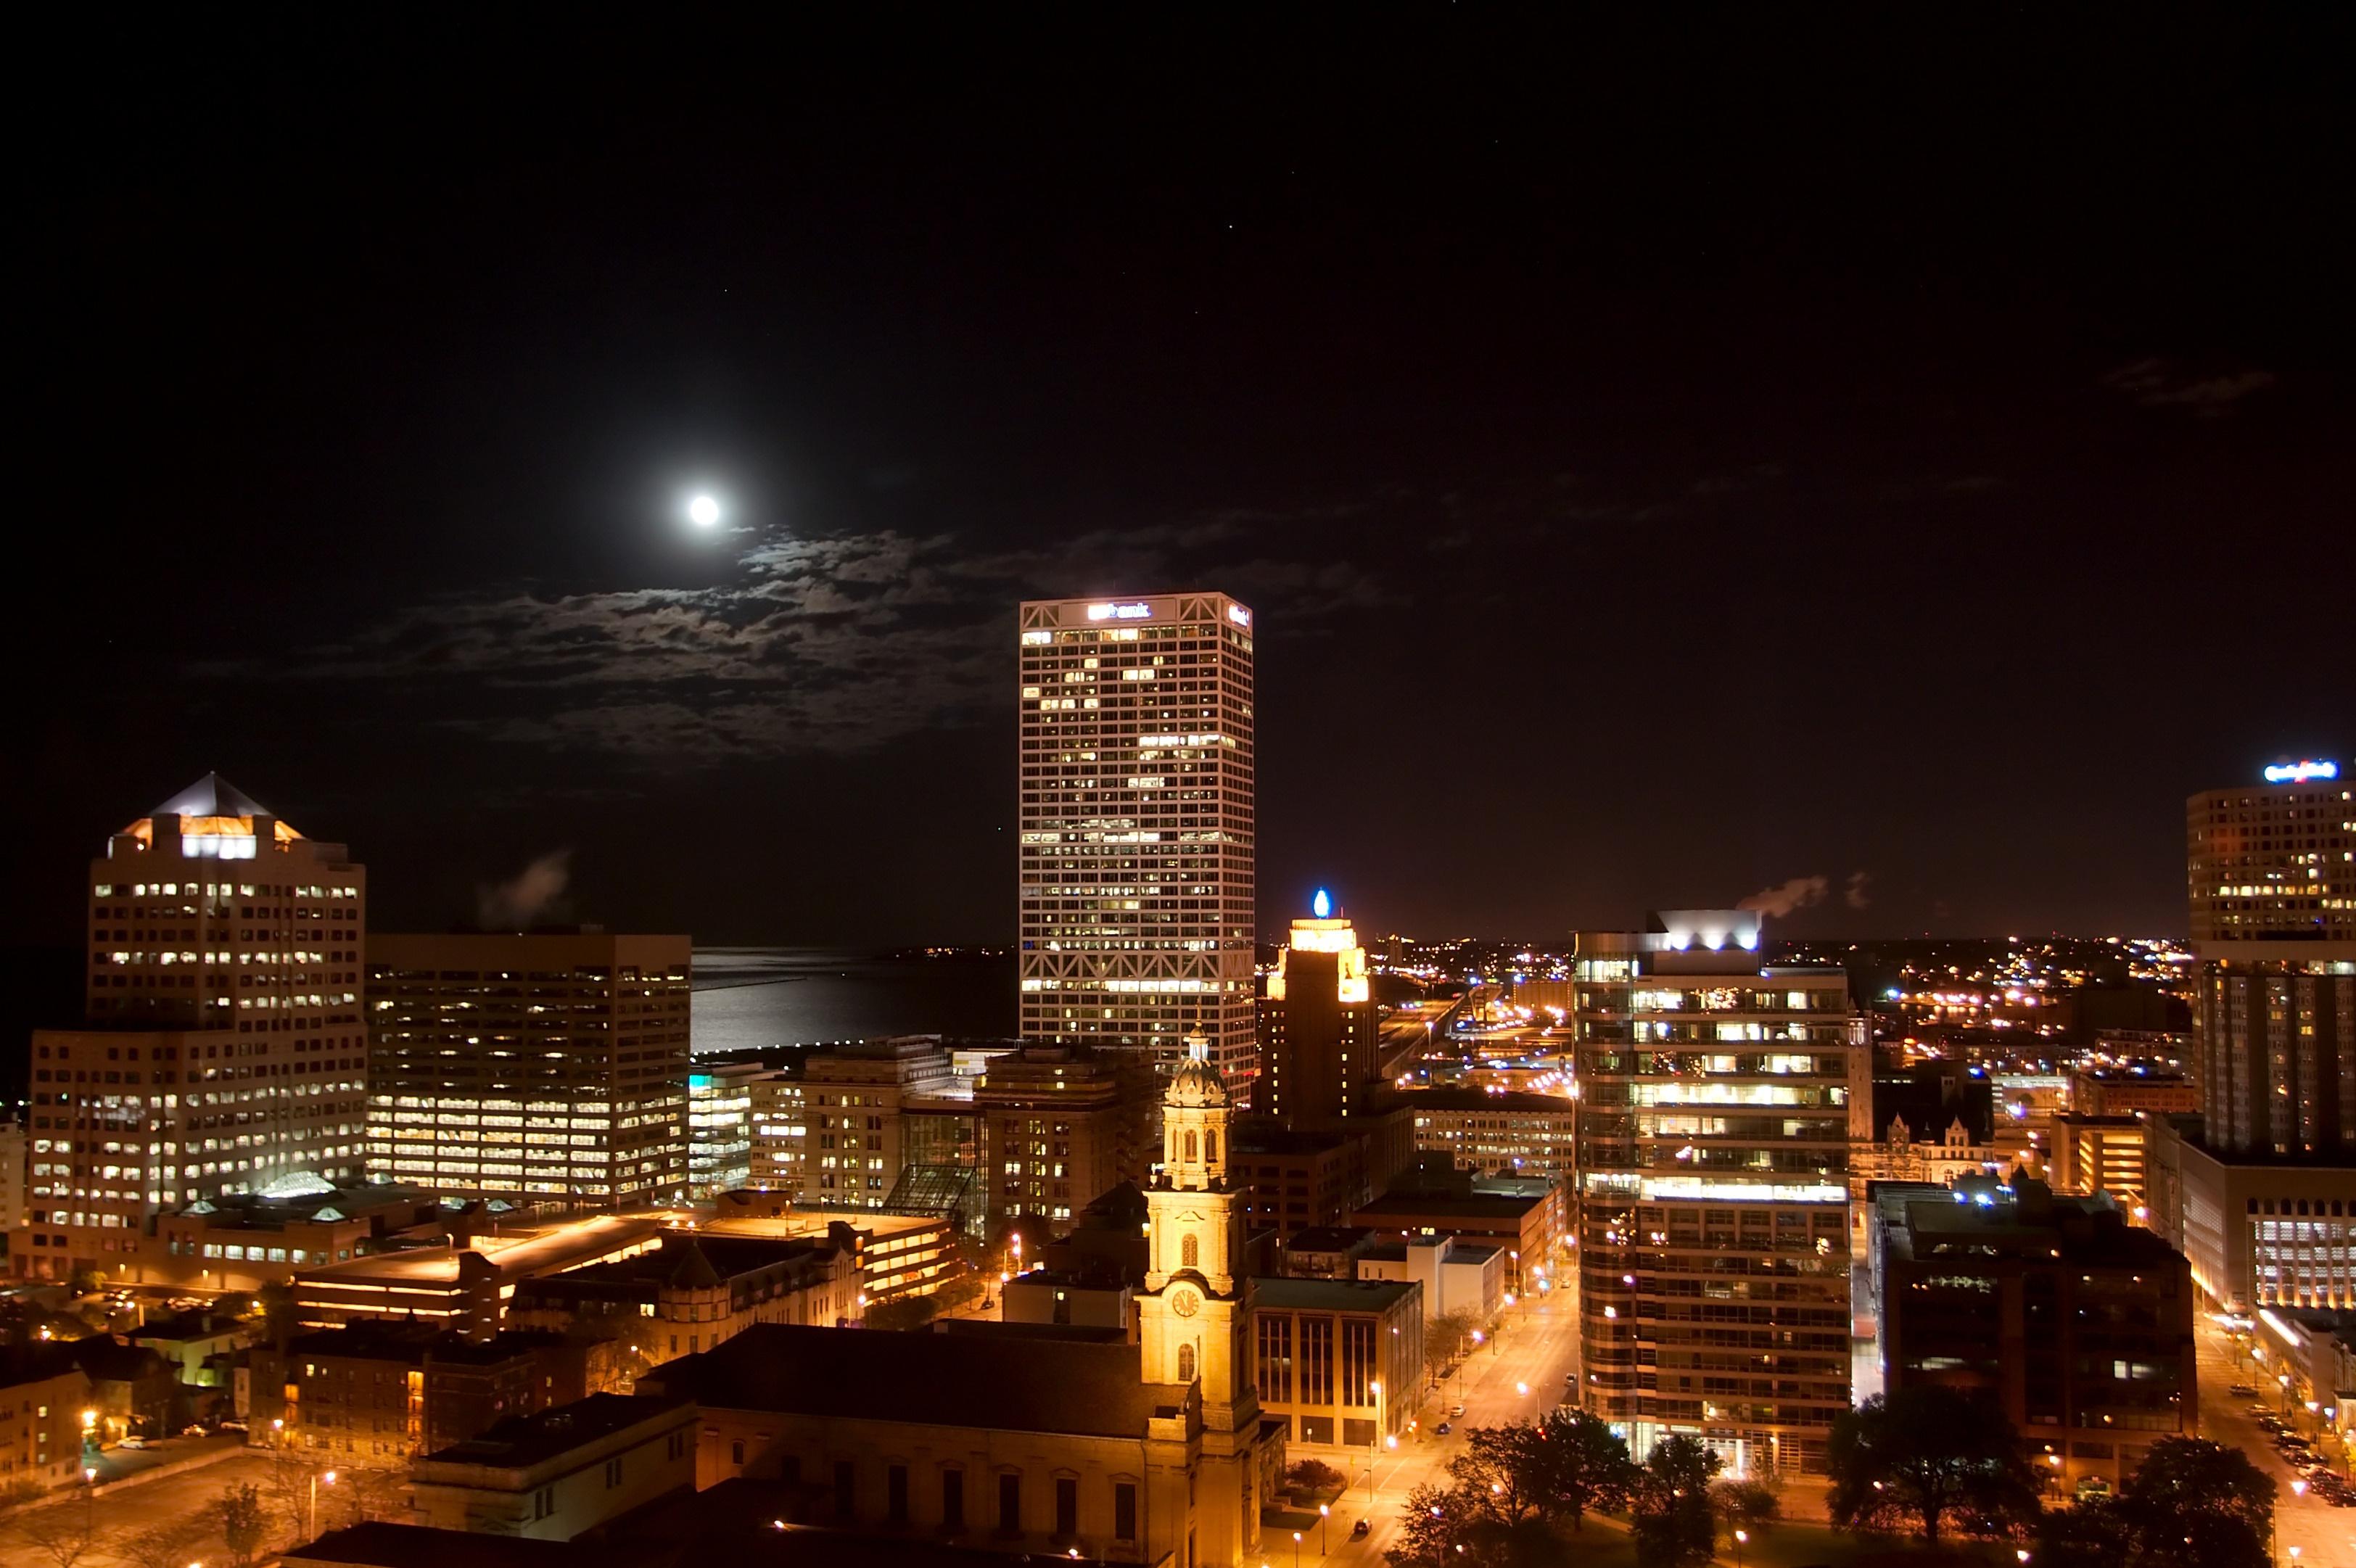 Milwaukee_Wisconsin_at_night_5441.jpg